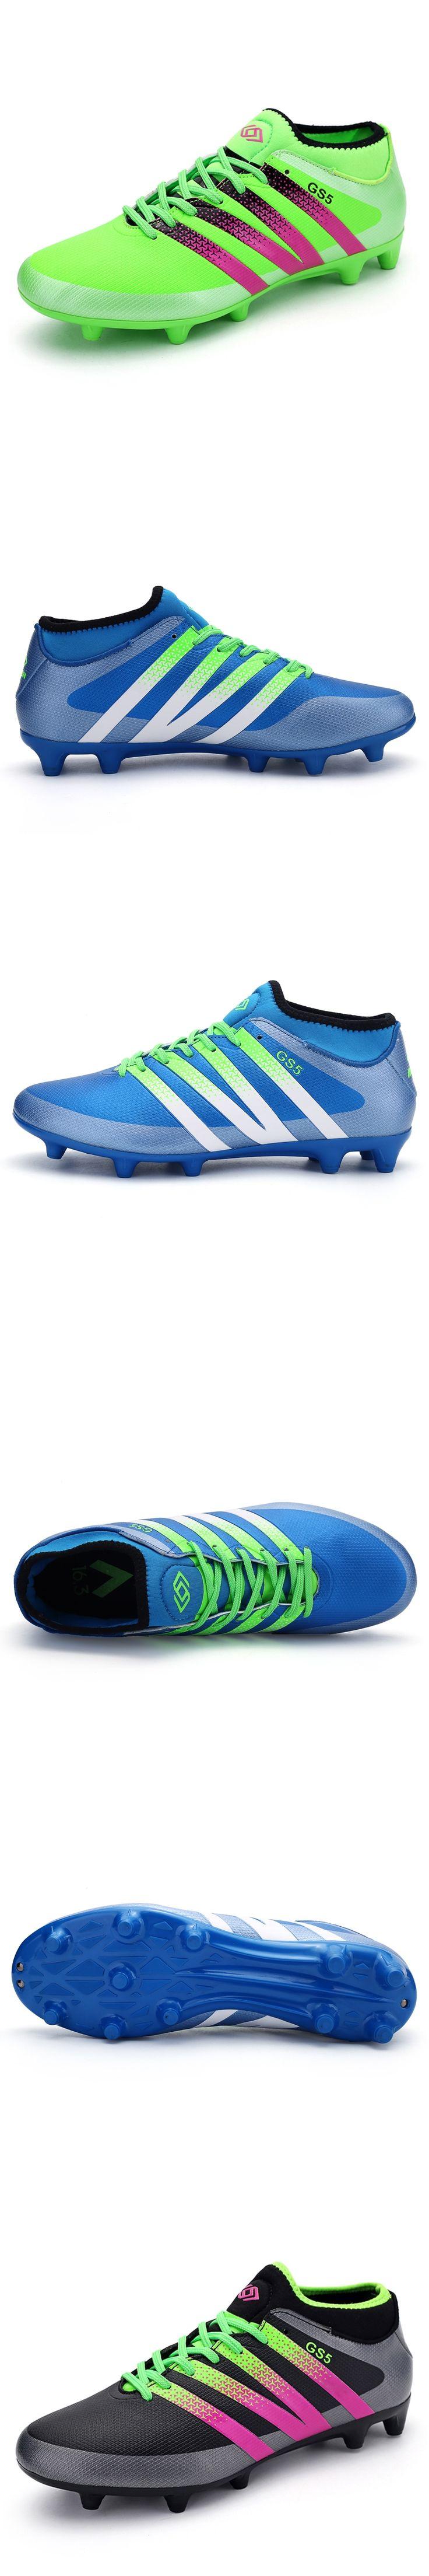 Mid Cut Teenager Football Shoes Outdoor FG Soccer Cleats Firm Ground Kids Men Boys Soccer Boots Scarpe Da Calcio Size 35-44